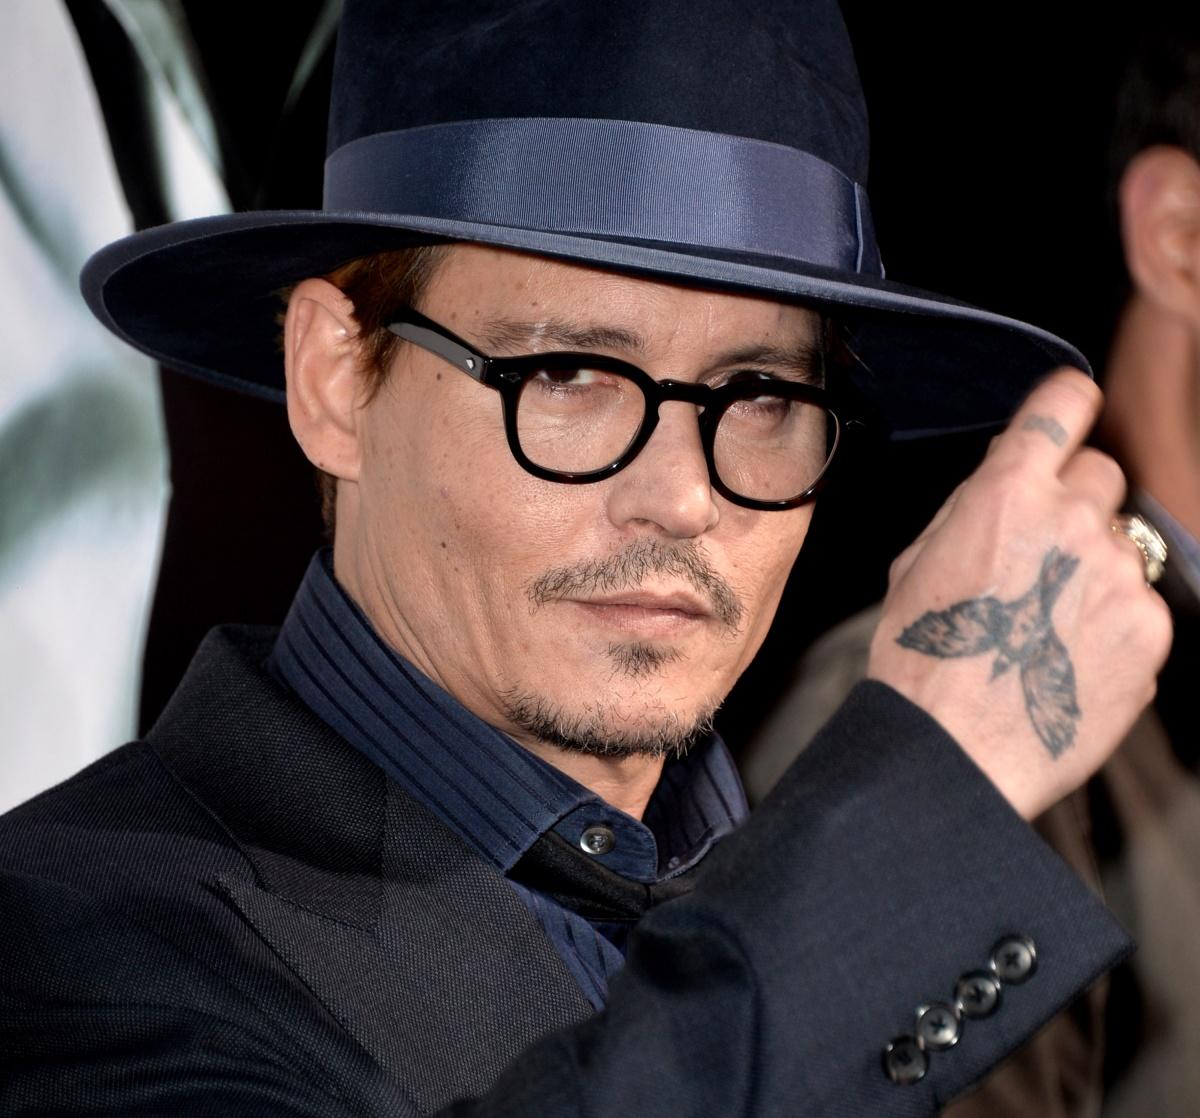 Depp was breaching Australia's quarantine laws.